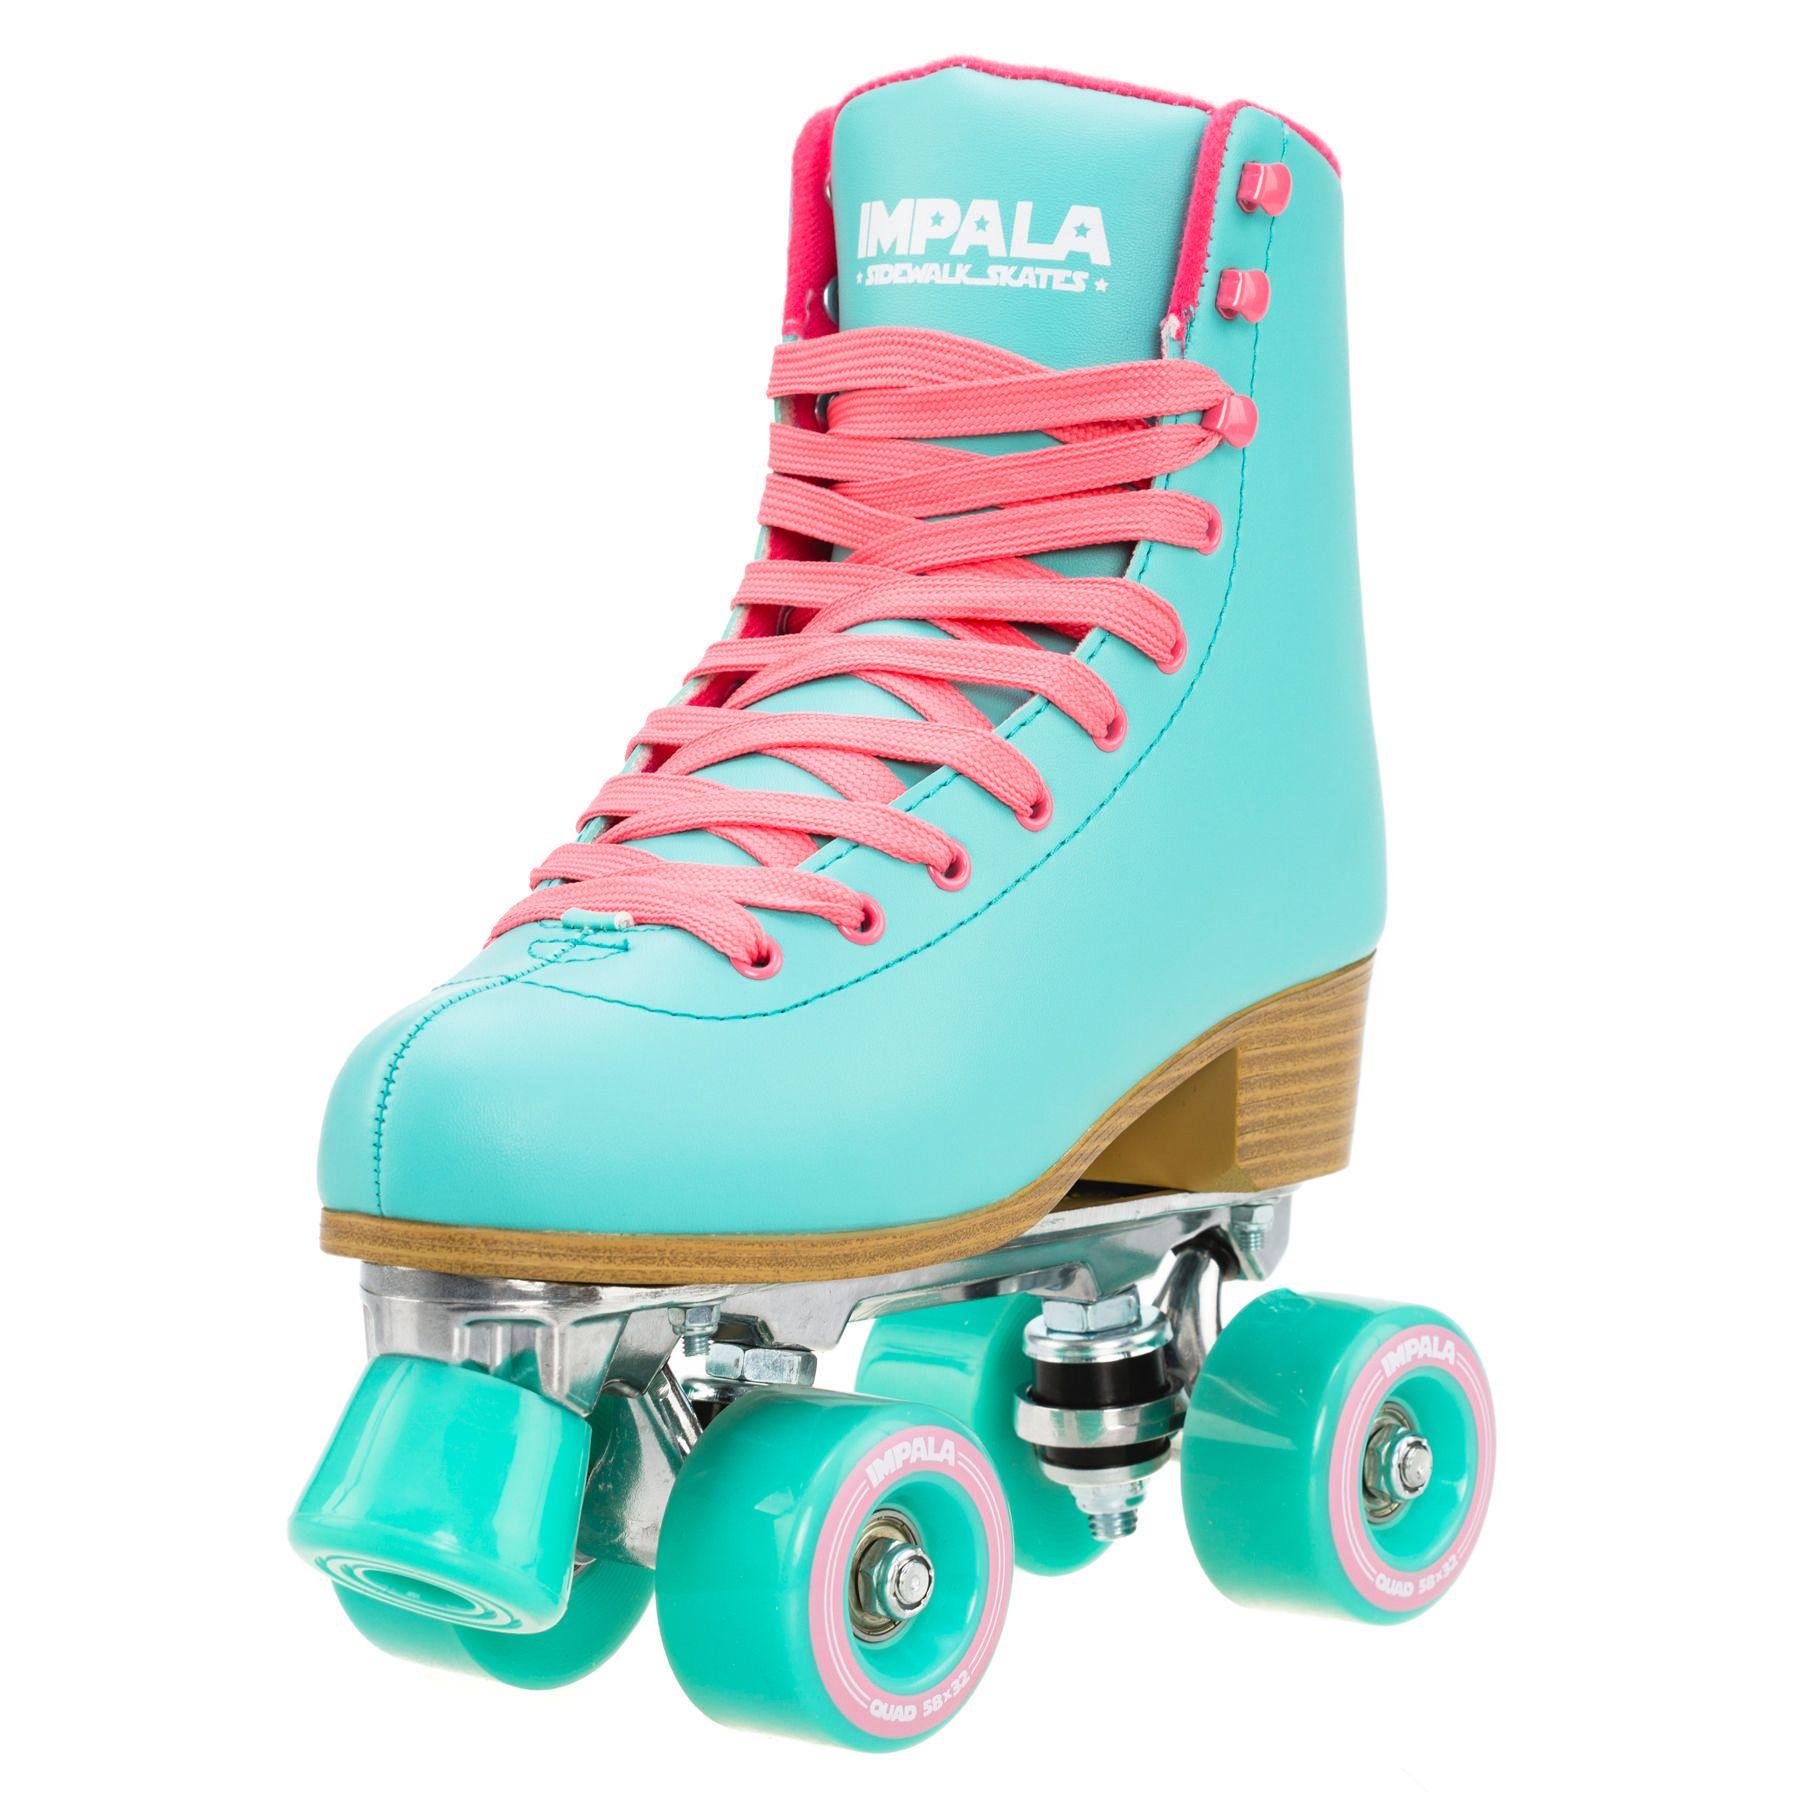 Sidewalk Roller Skates 139 99 City Beach Australia Roller Skate Shoes Roller Shoes Roller Skates